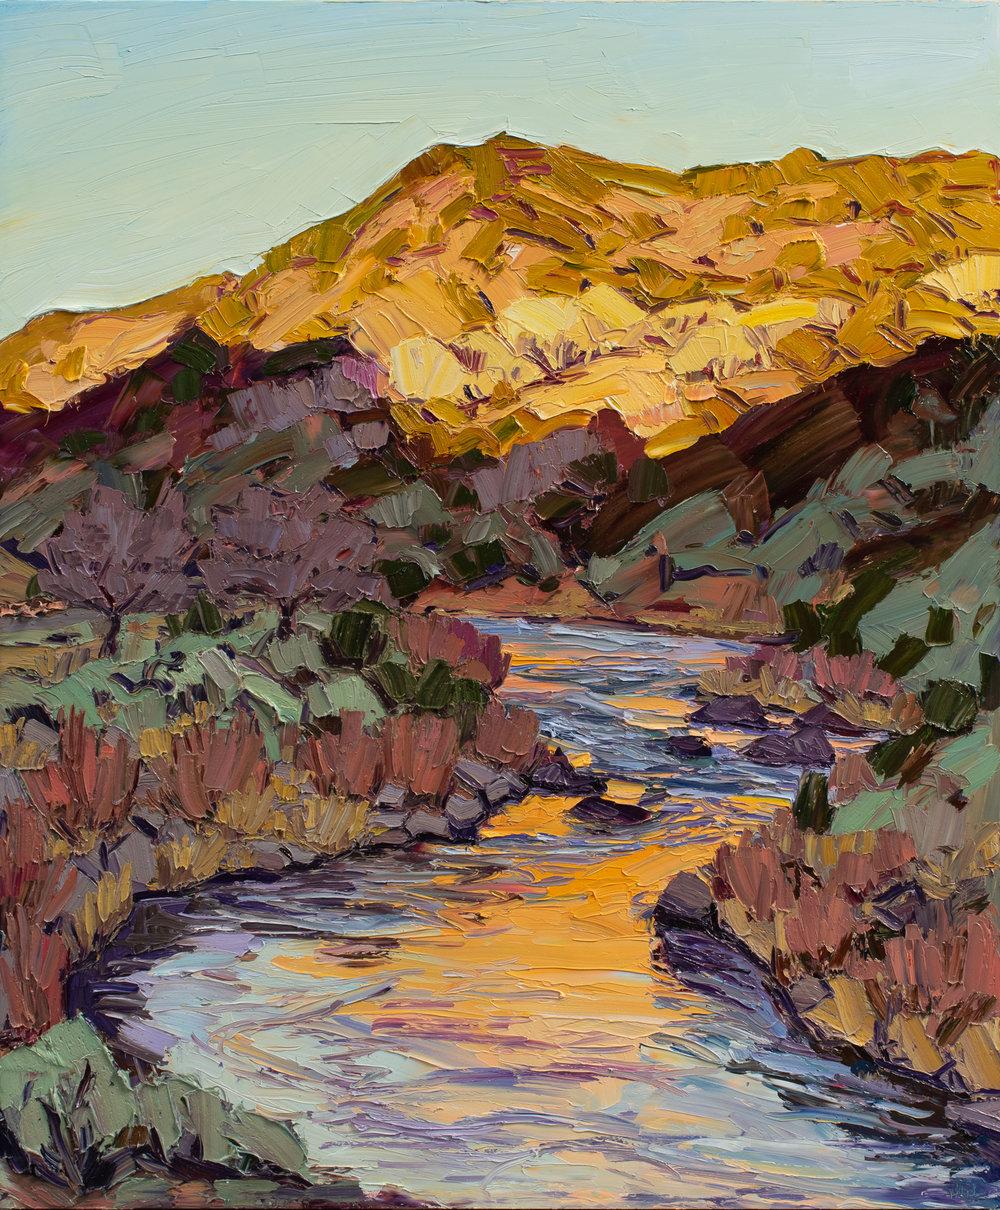 Downstream sunrise